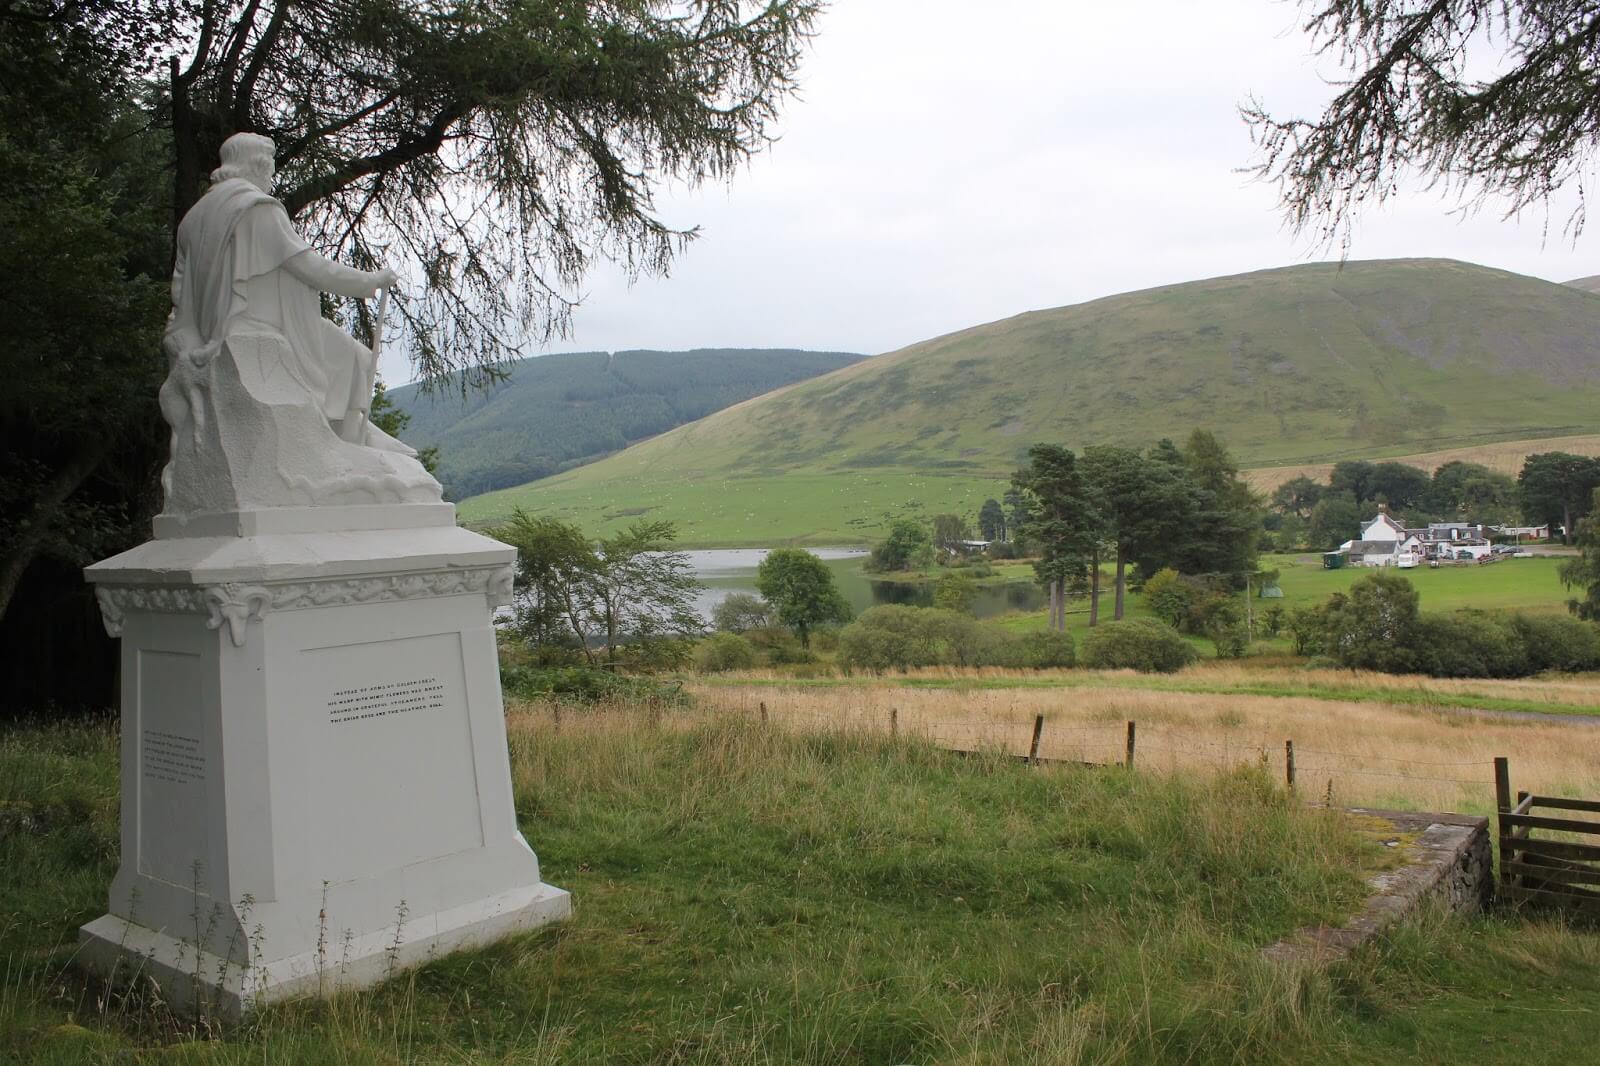 Edinburgh water supply